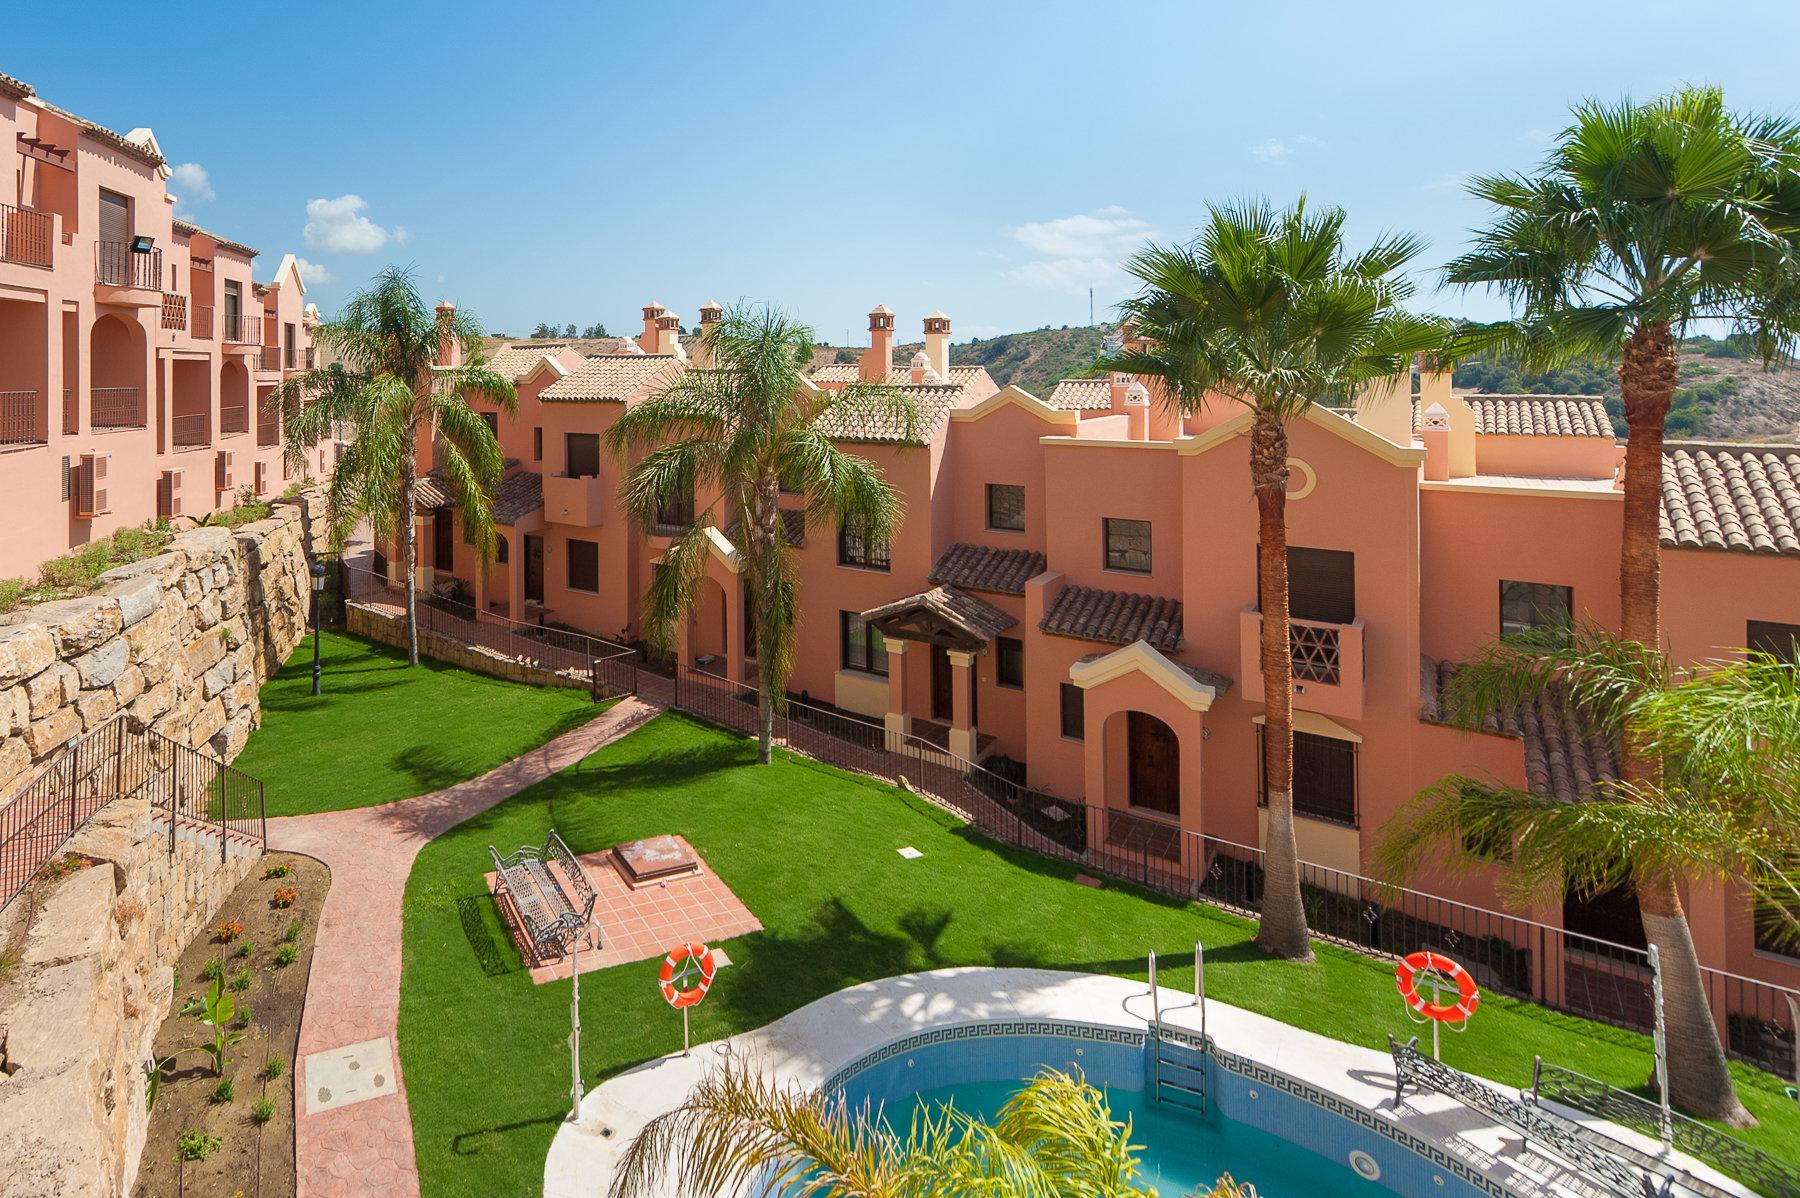 Агенства недвижимости по испании